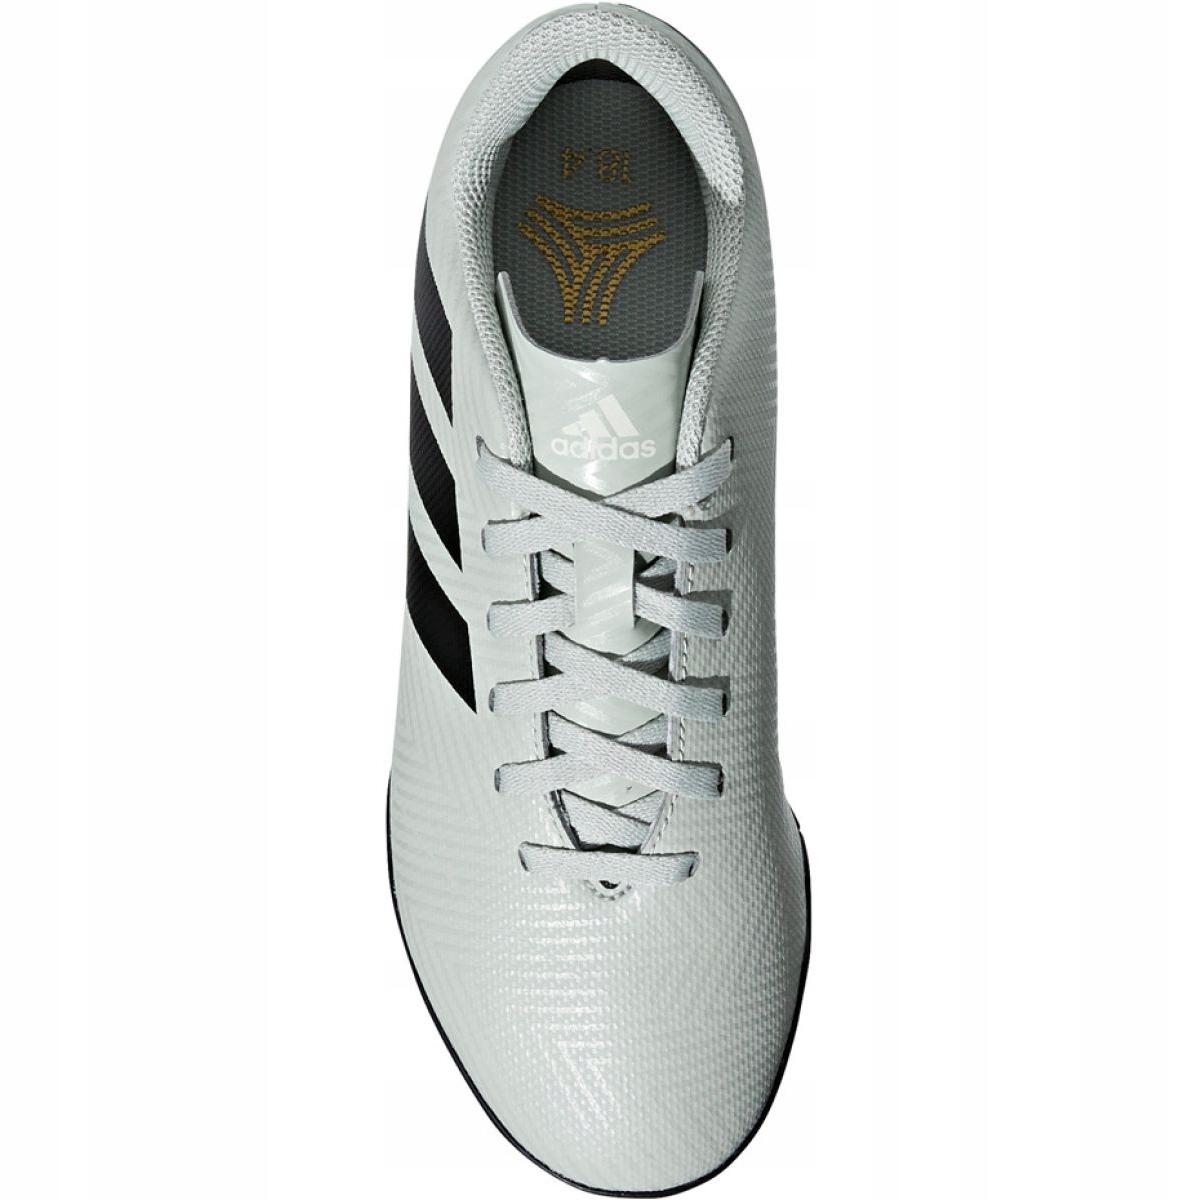 Details zu Adidas Nemeziz Tango 18.4 Tf Jr DB2380 Fußballschuhe